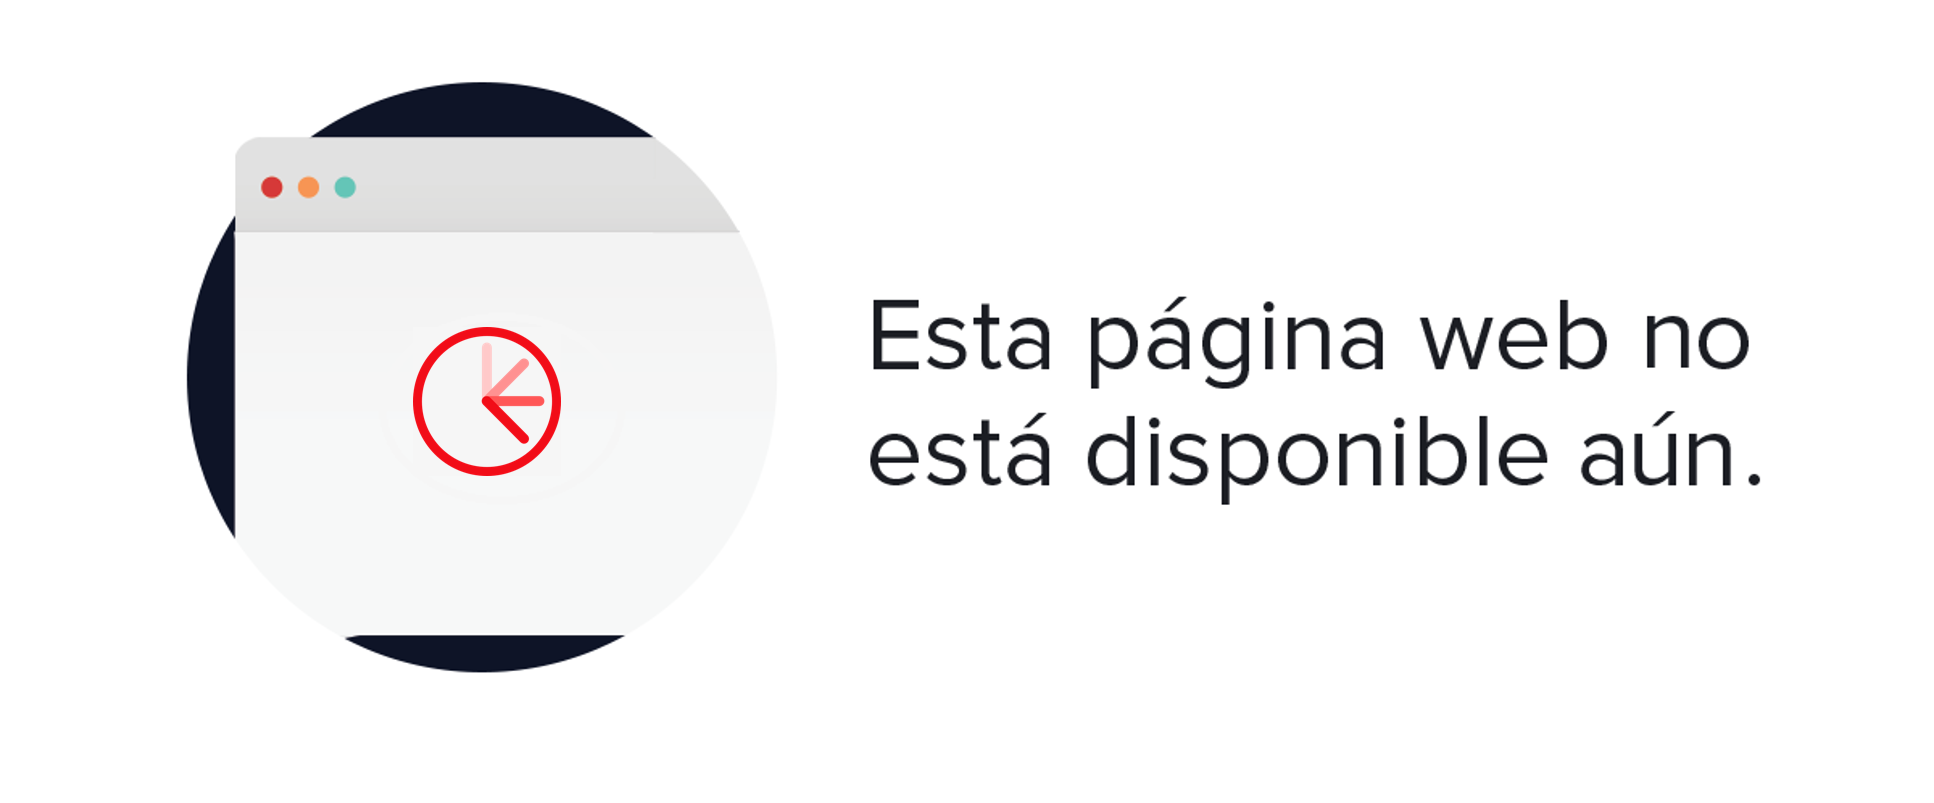 Woman El Corte Inglés - Pantalón recto de mujer Woman El Corte Inglés con estampado de cuadros Gris 001051036100017038 - PCWMHPV